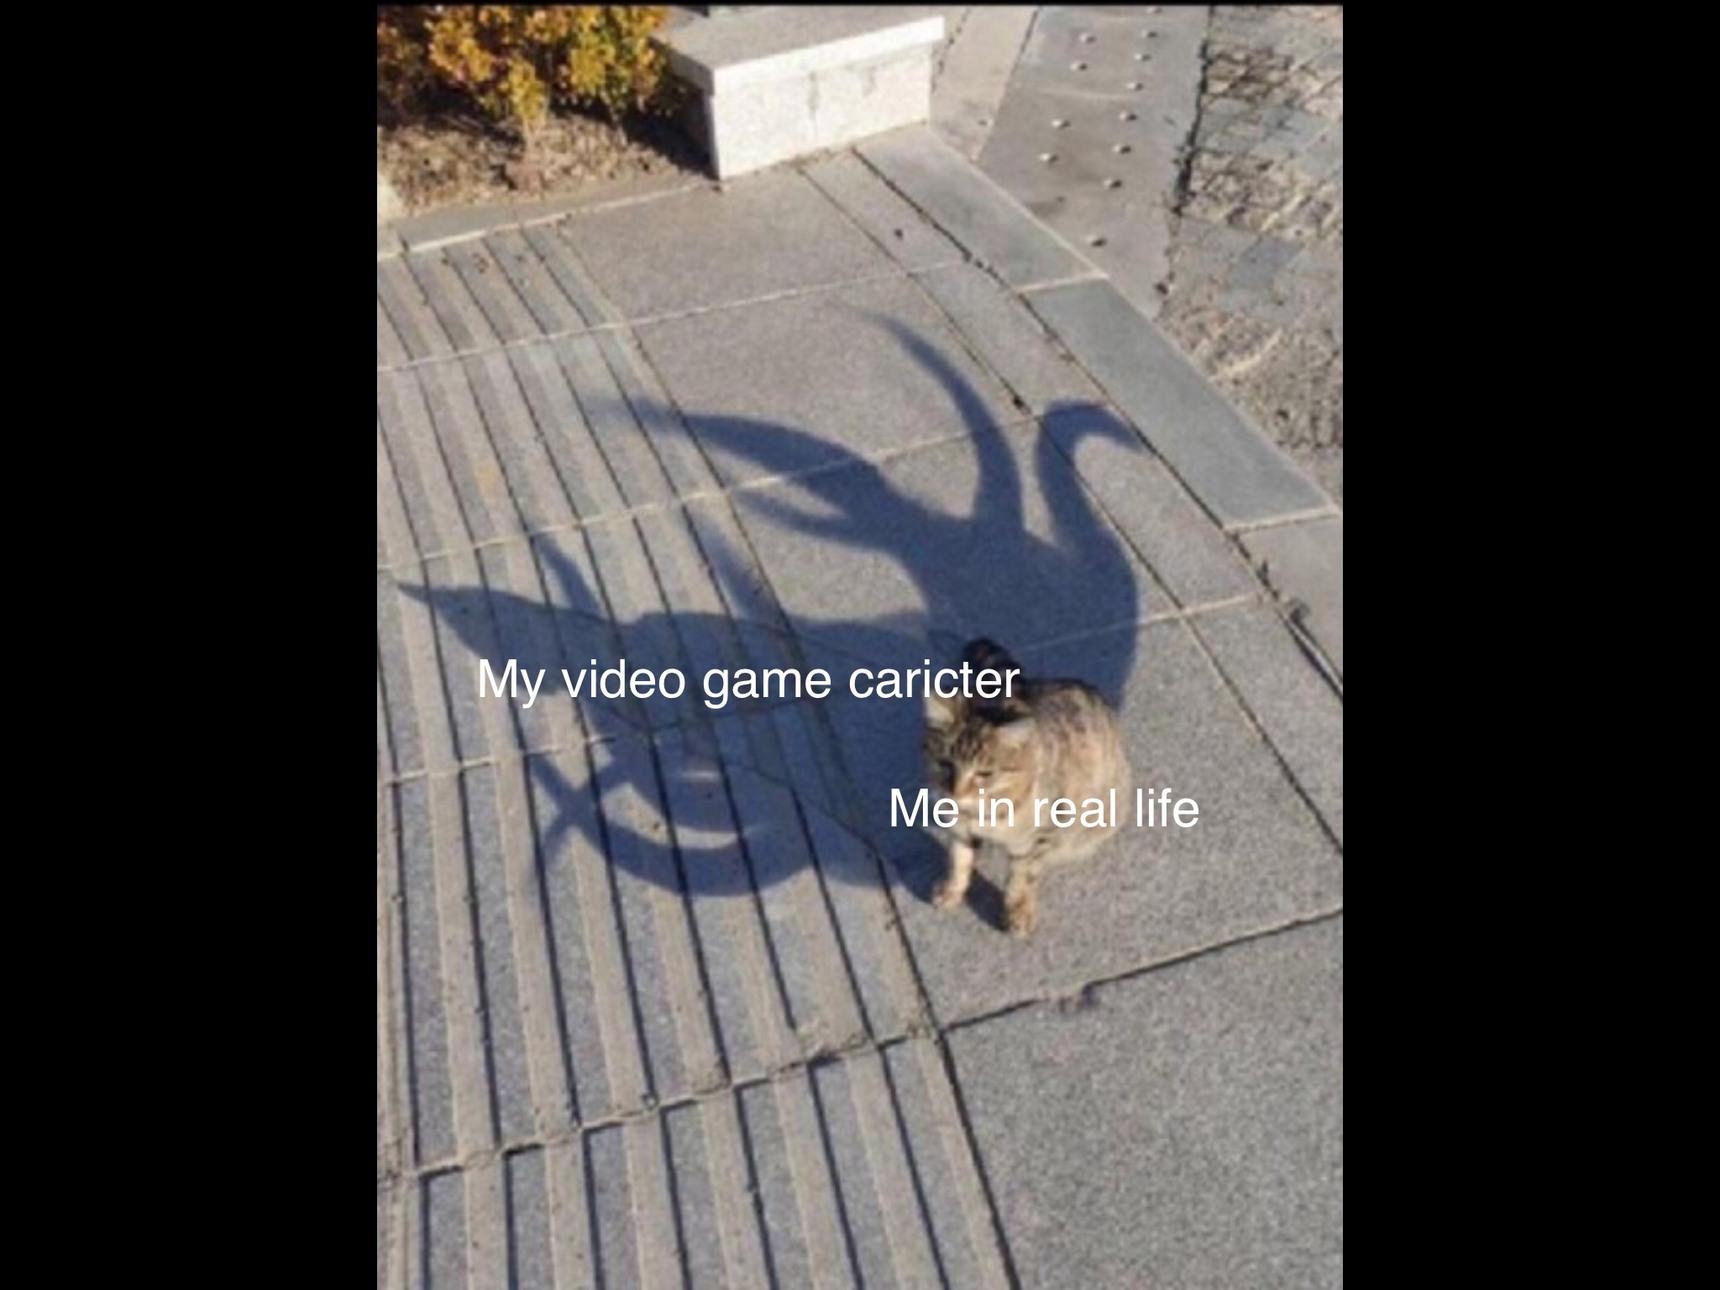 5th world godess vs the real you - meme